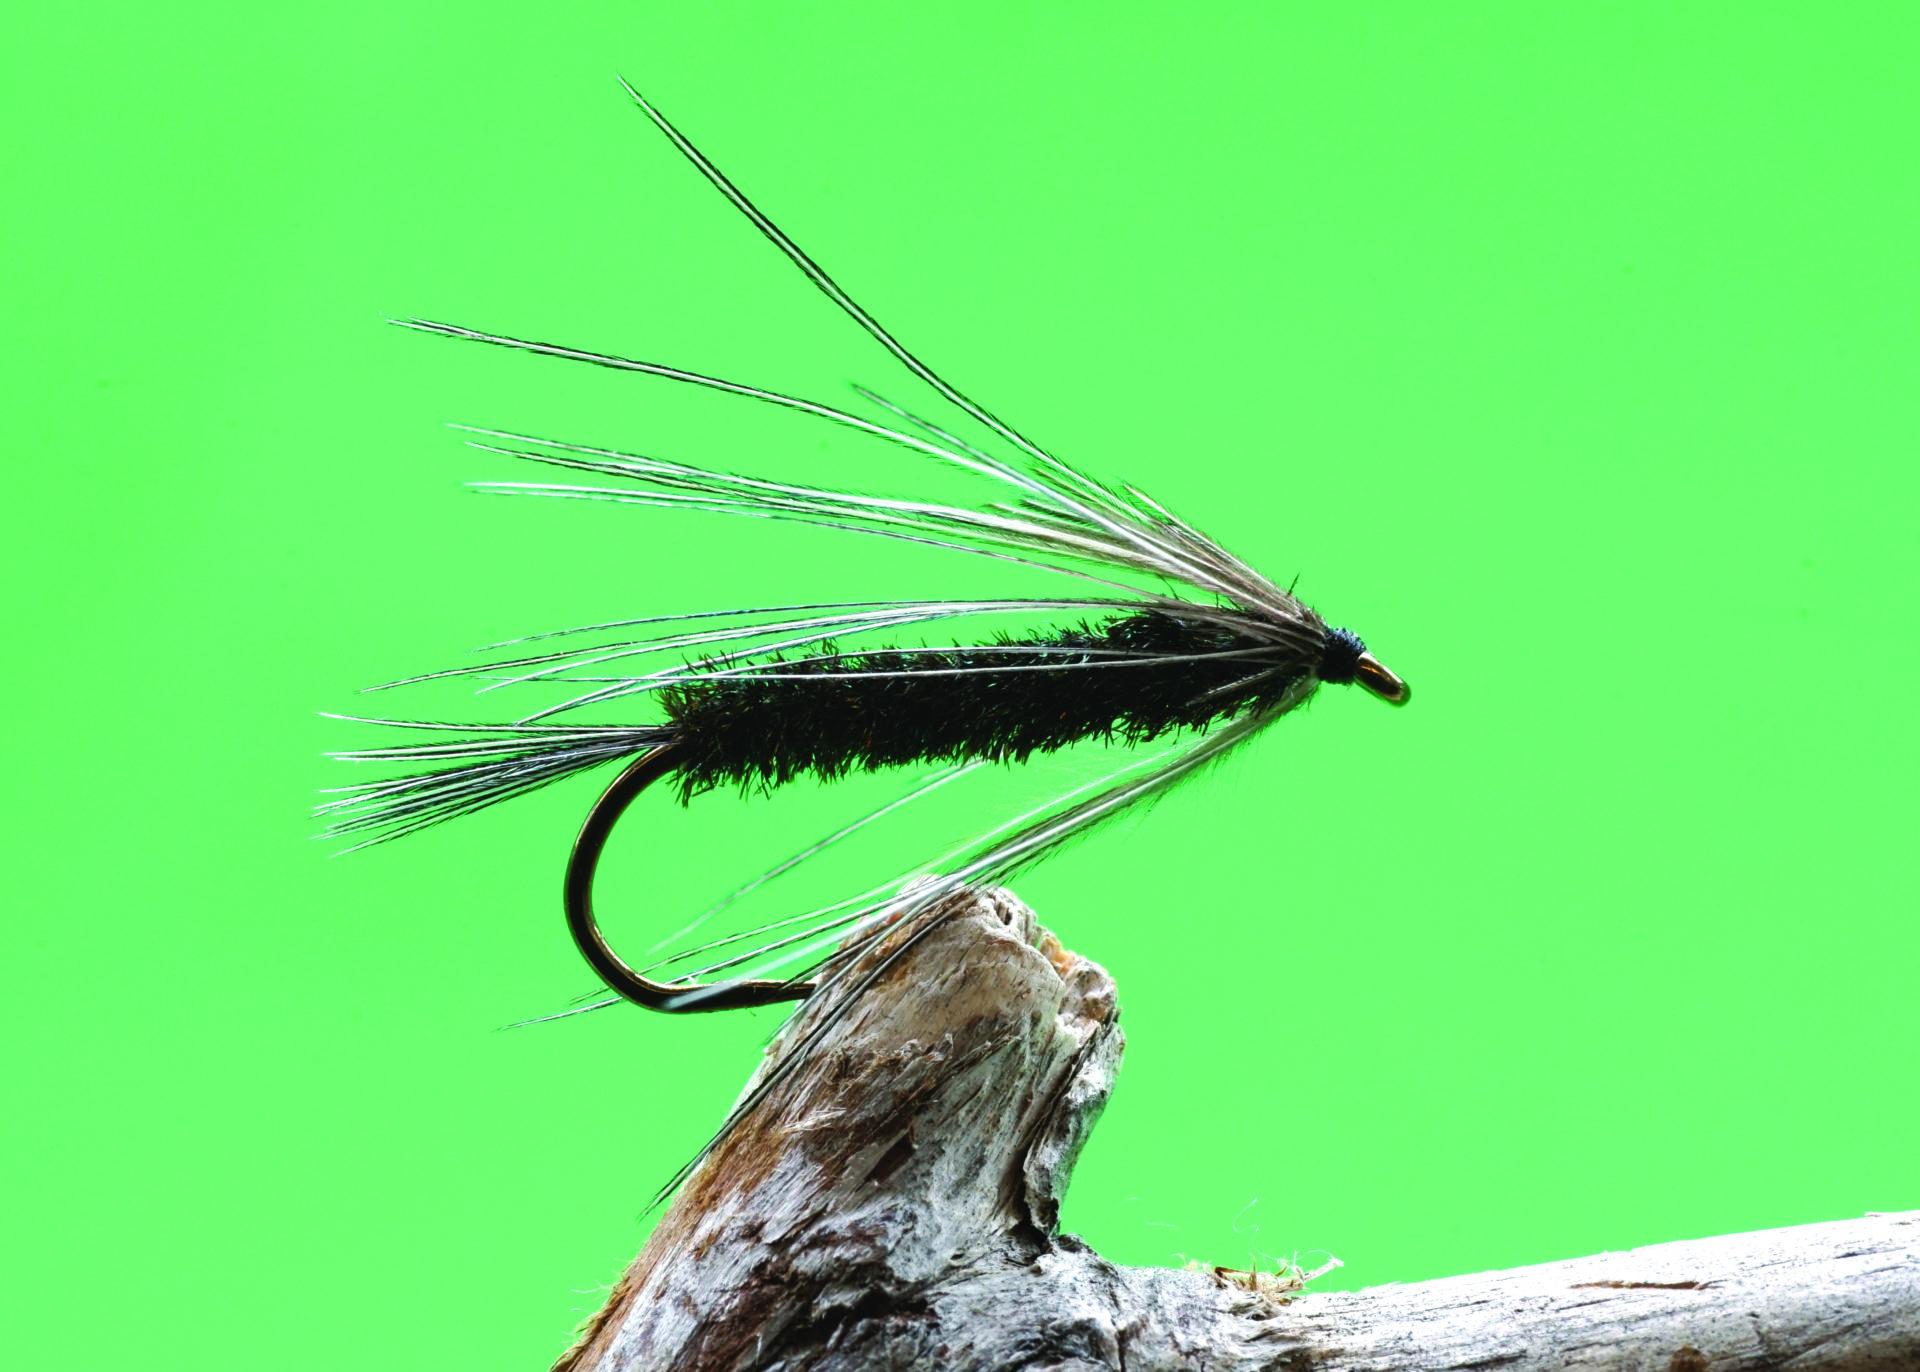 Peacock Carey.